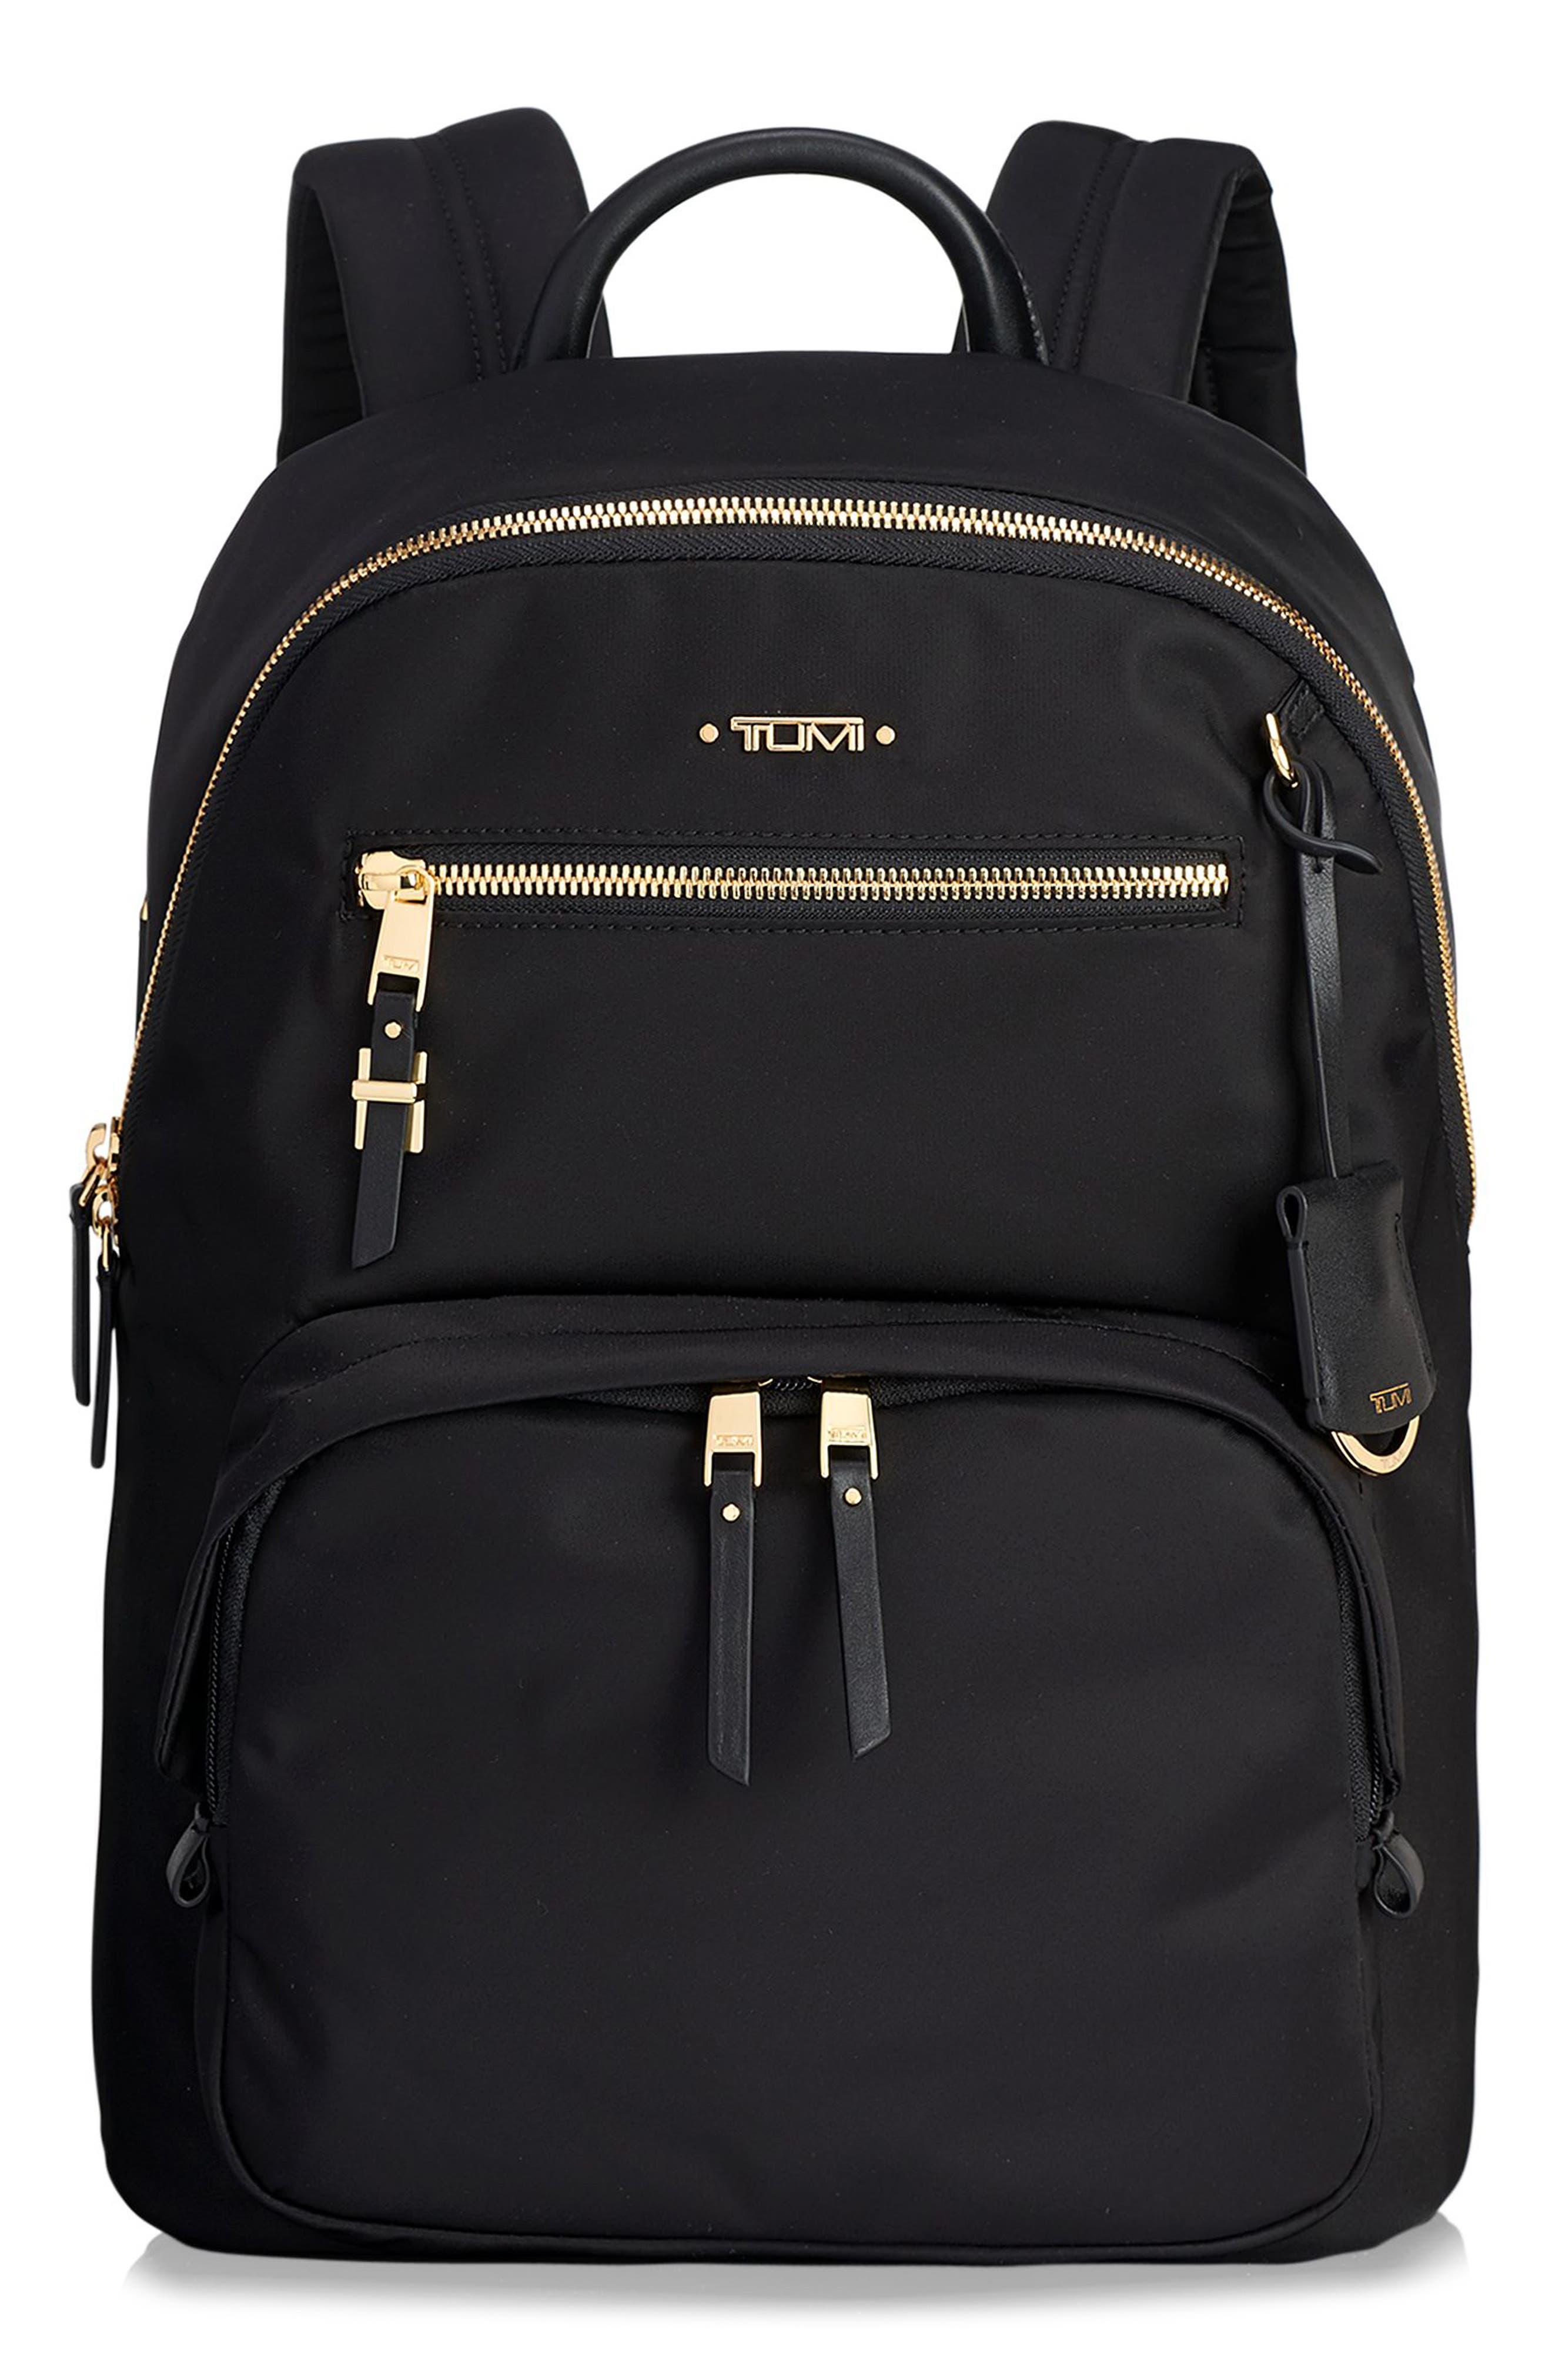 Voyageur Hagen Nylon Backpack,                             Main thumbnail 1, color,                             BLACK